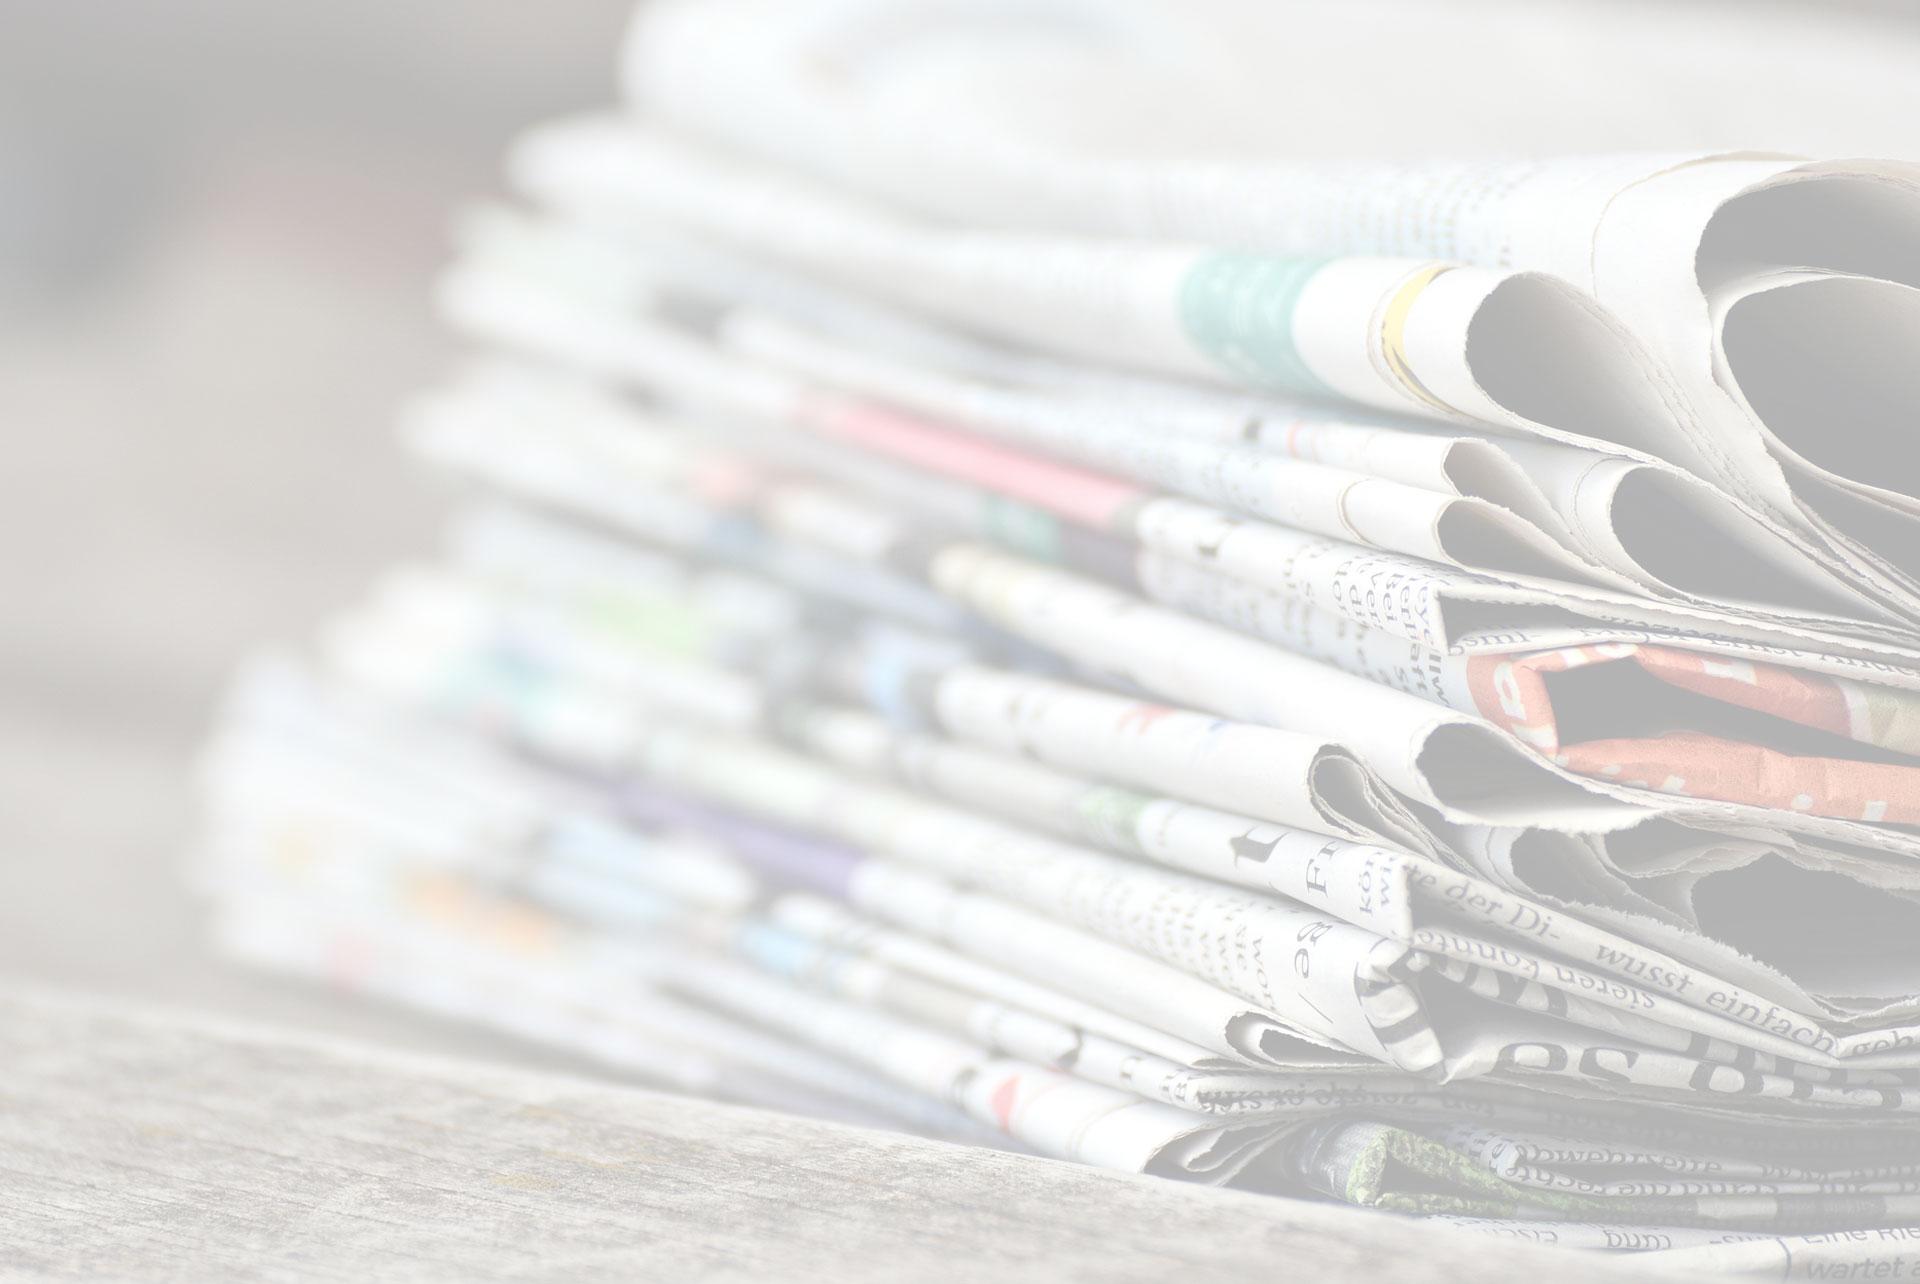 Stefano Carrer